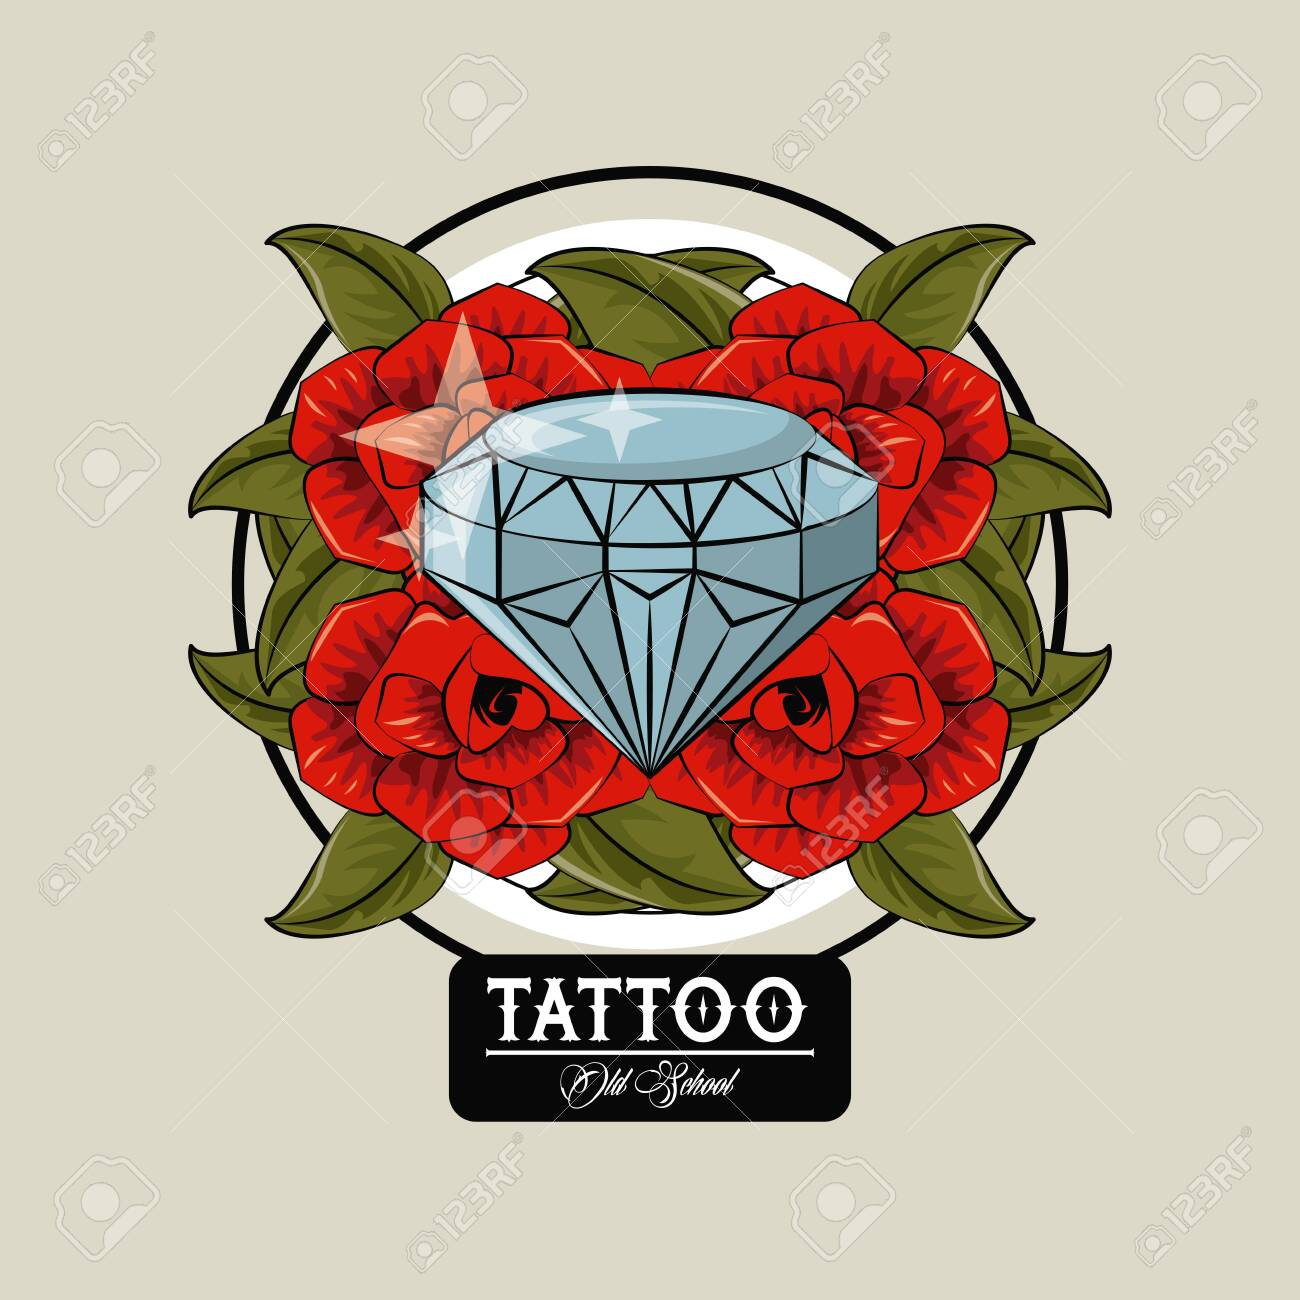 Tattoo studio old school drawings diamond and roses emblem vector..